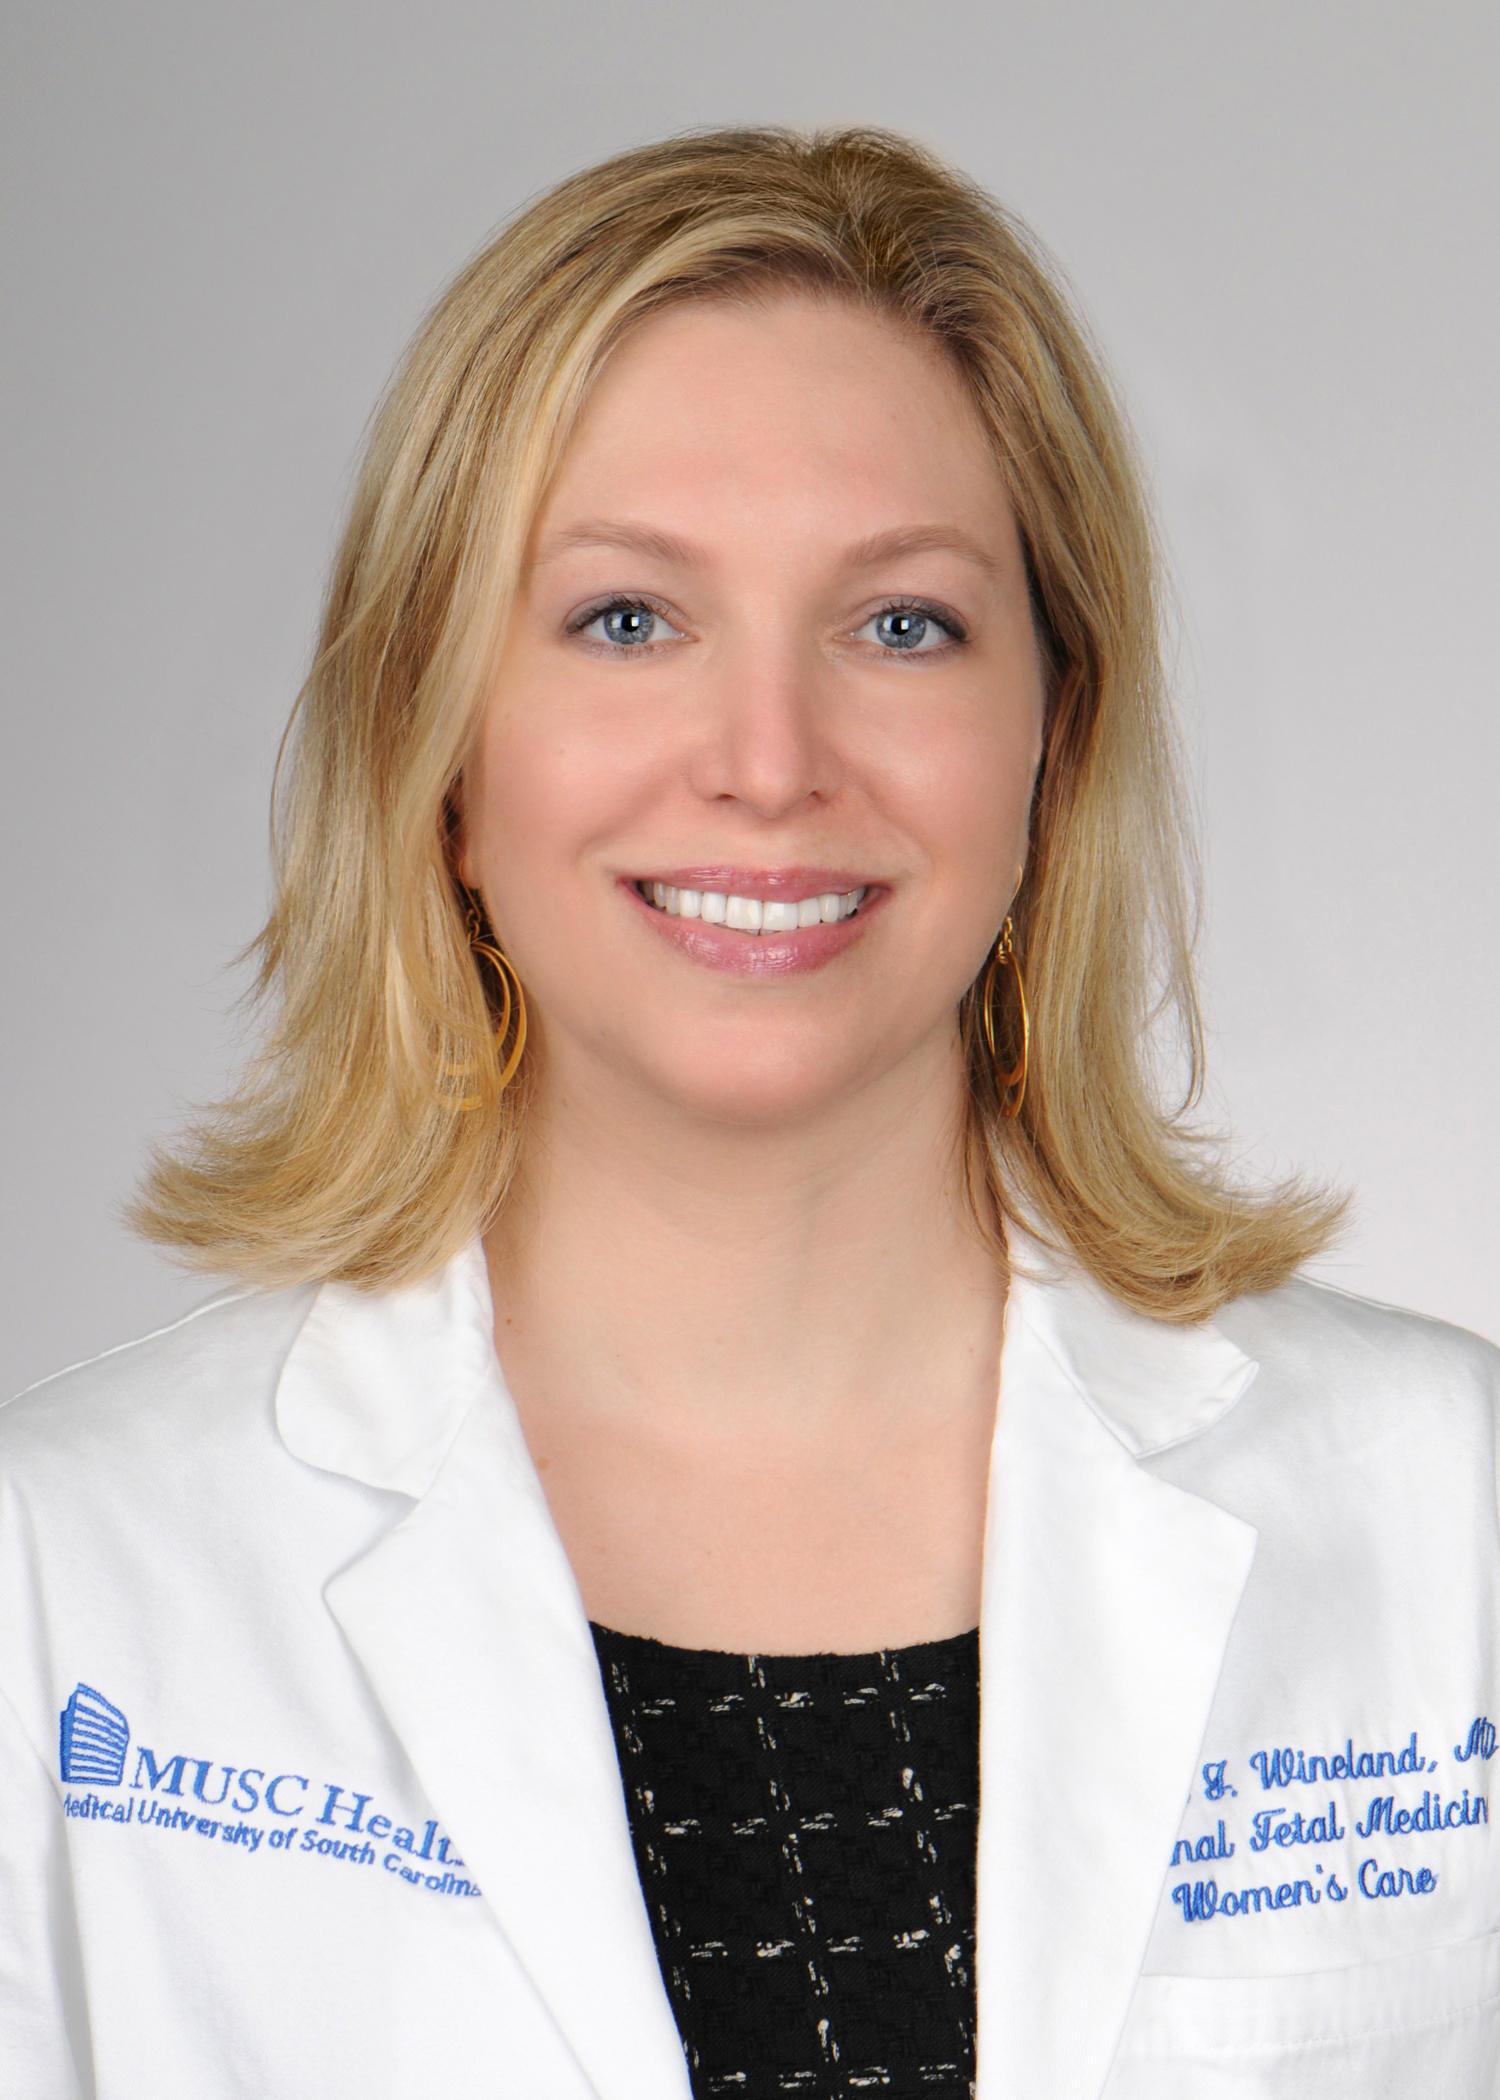 Rebecca J Wineland MD